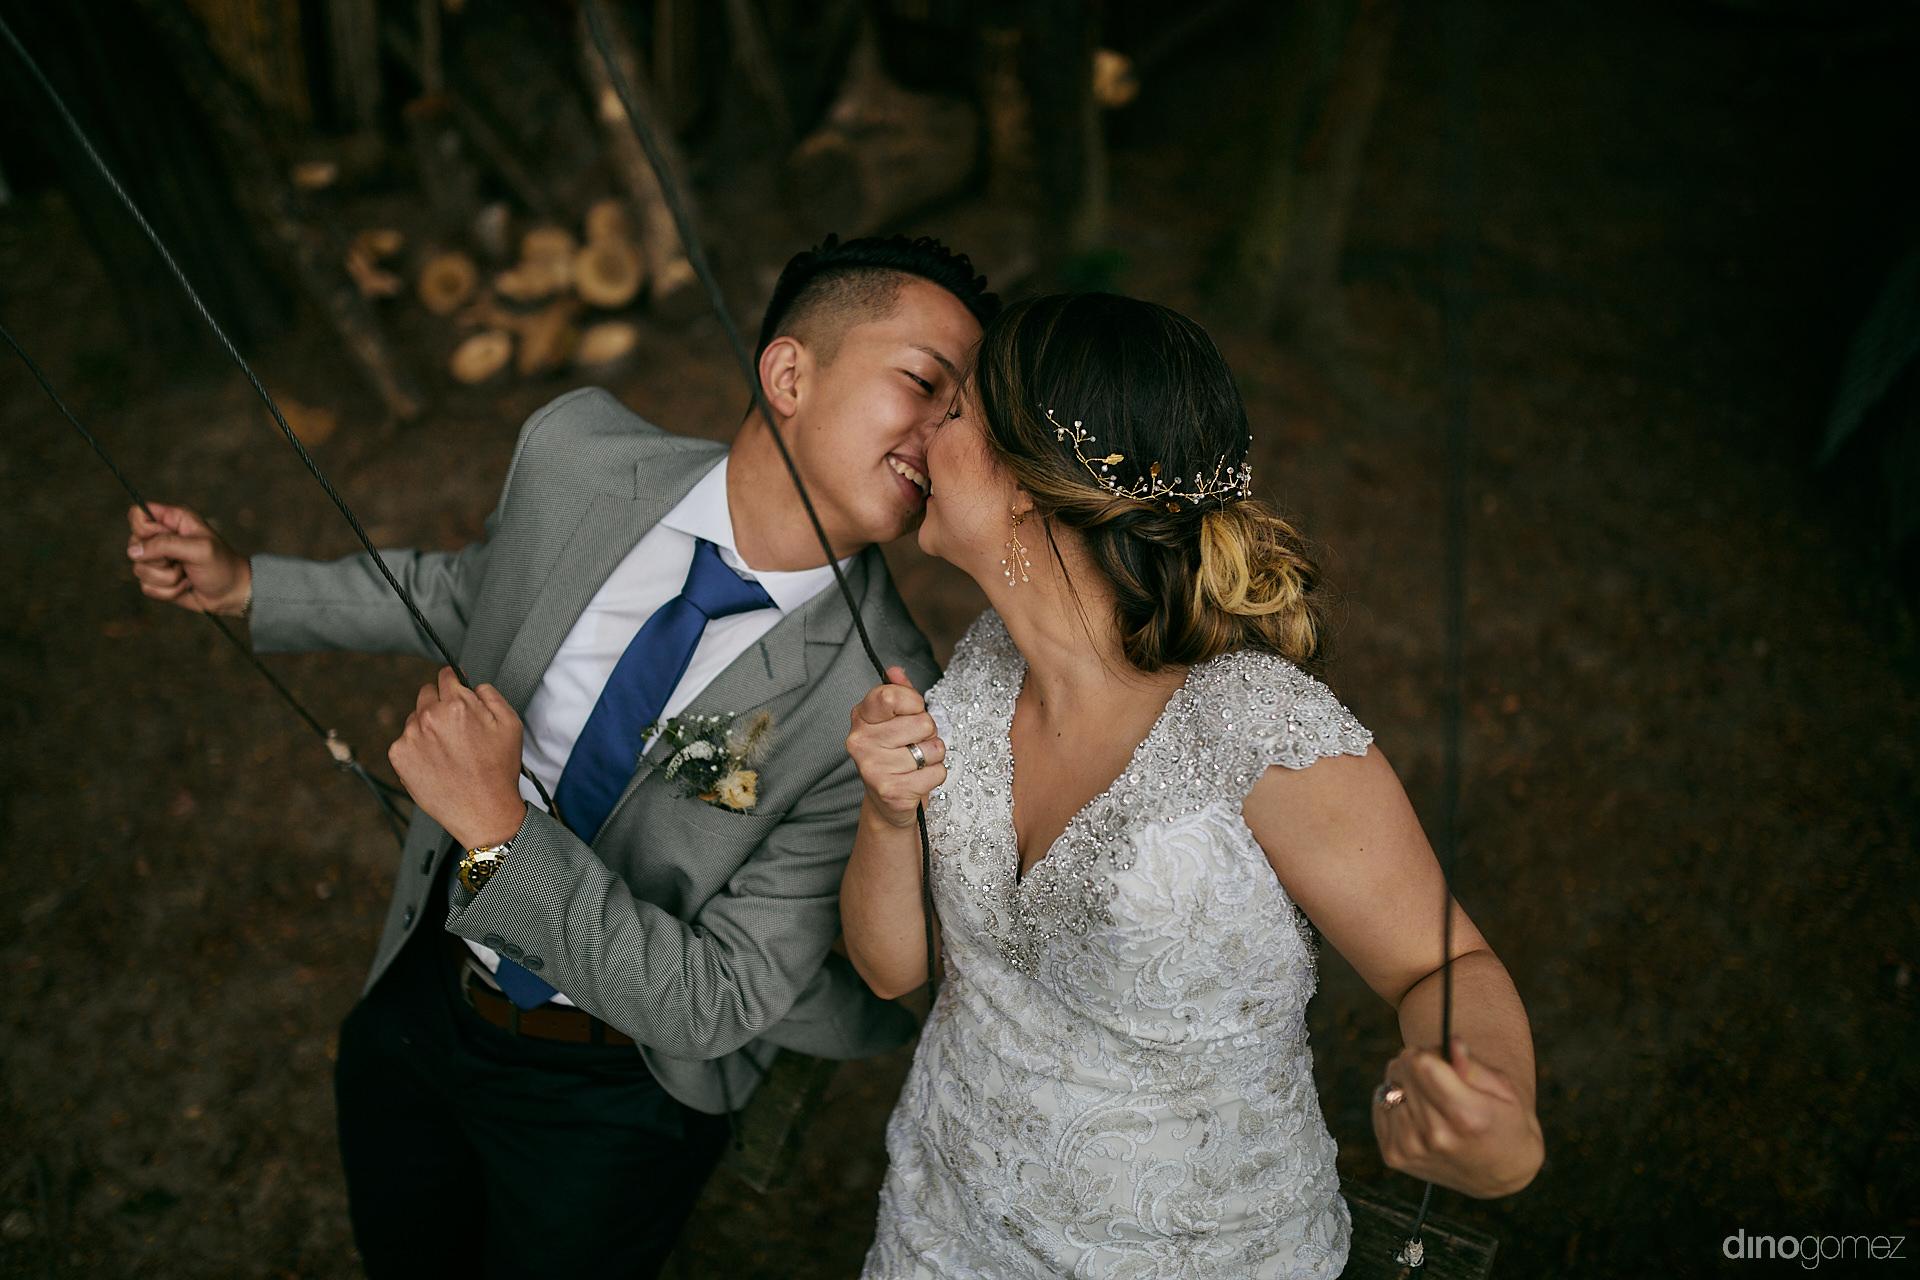 036 - Diy Budget Destination Weddings Can Be Prety Too!